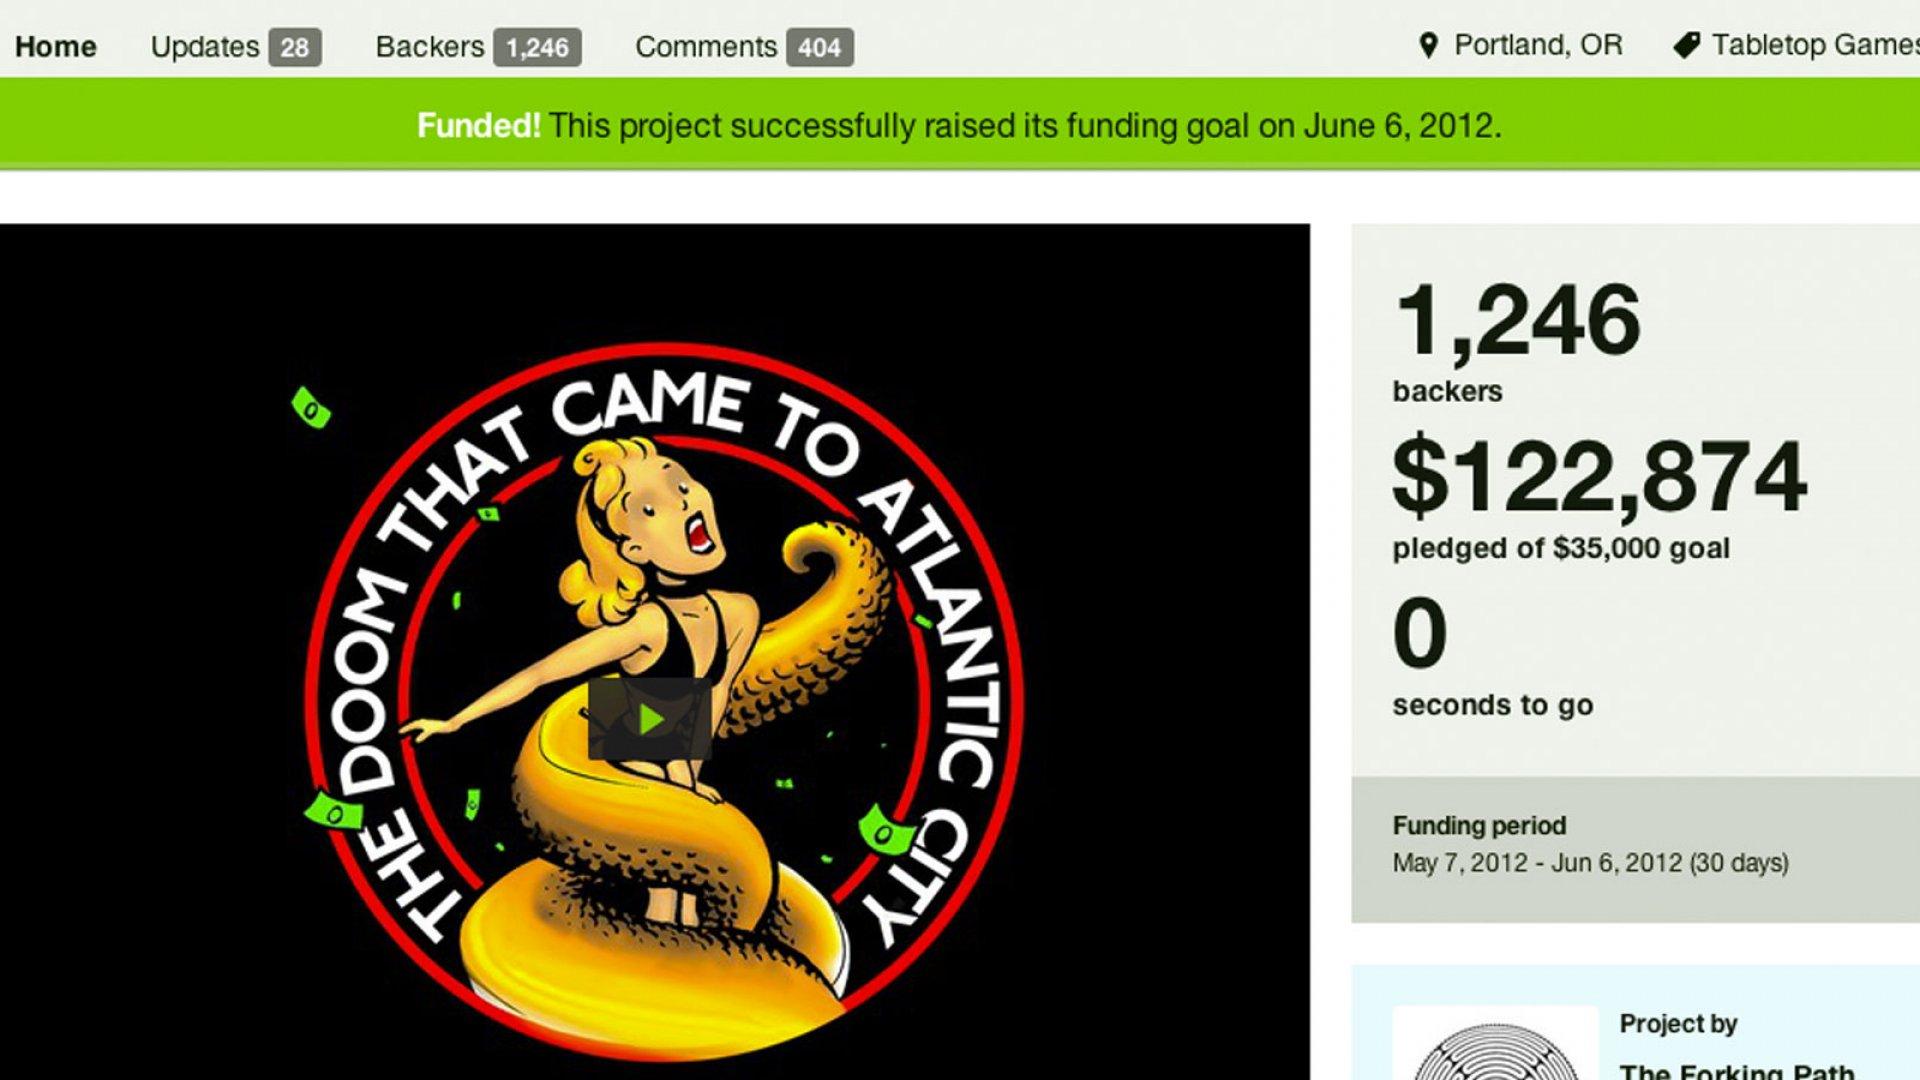 Kickstarter Should Do More to Protect Backers